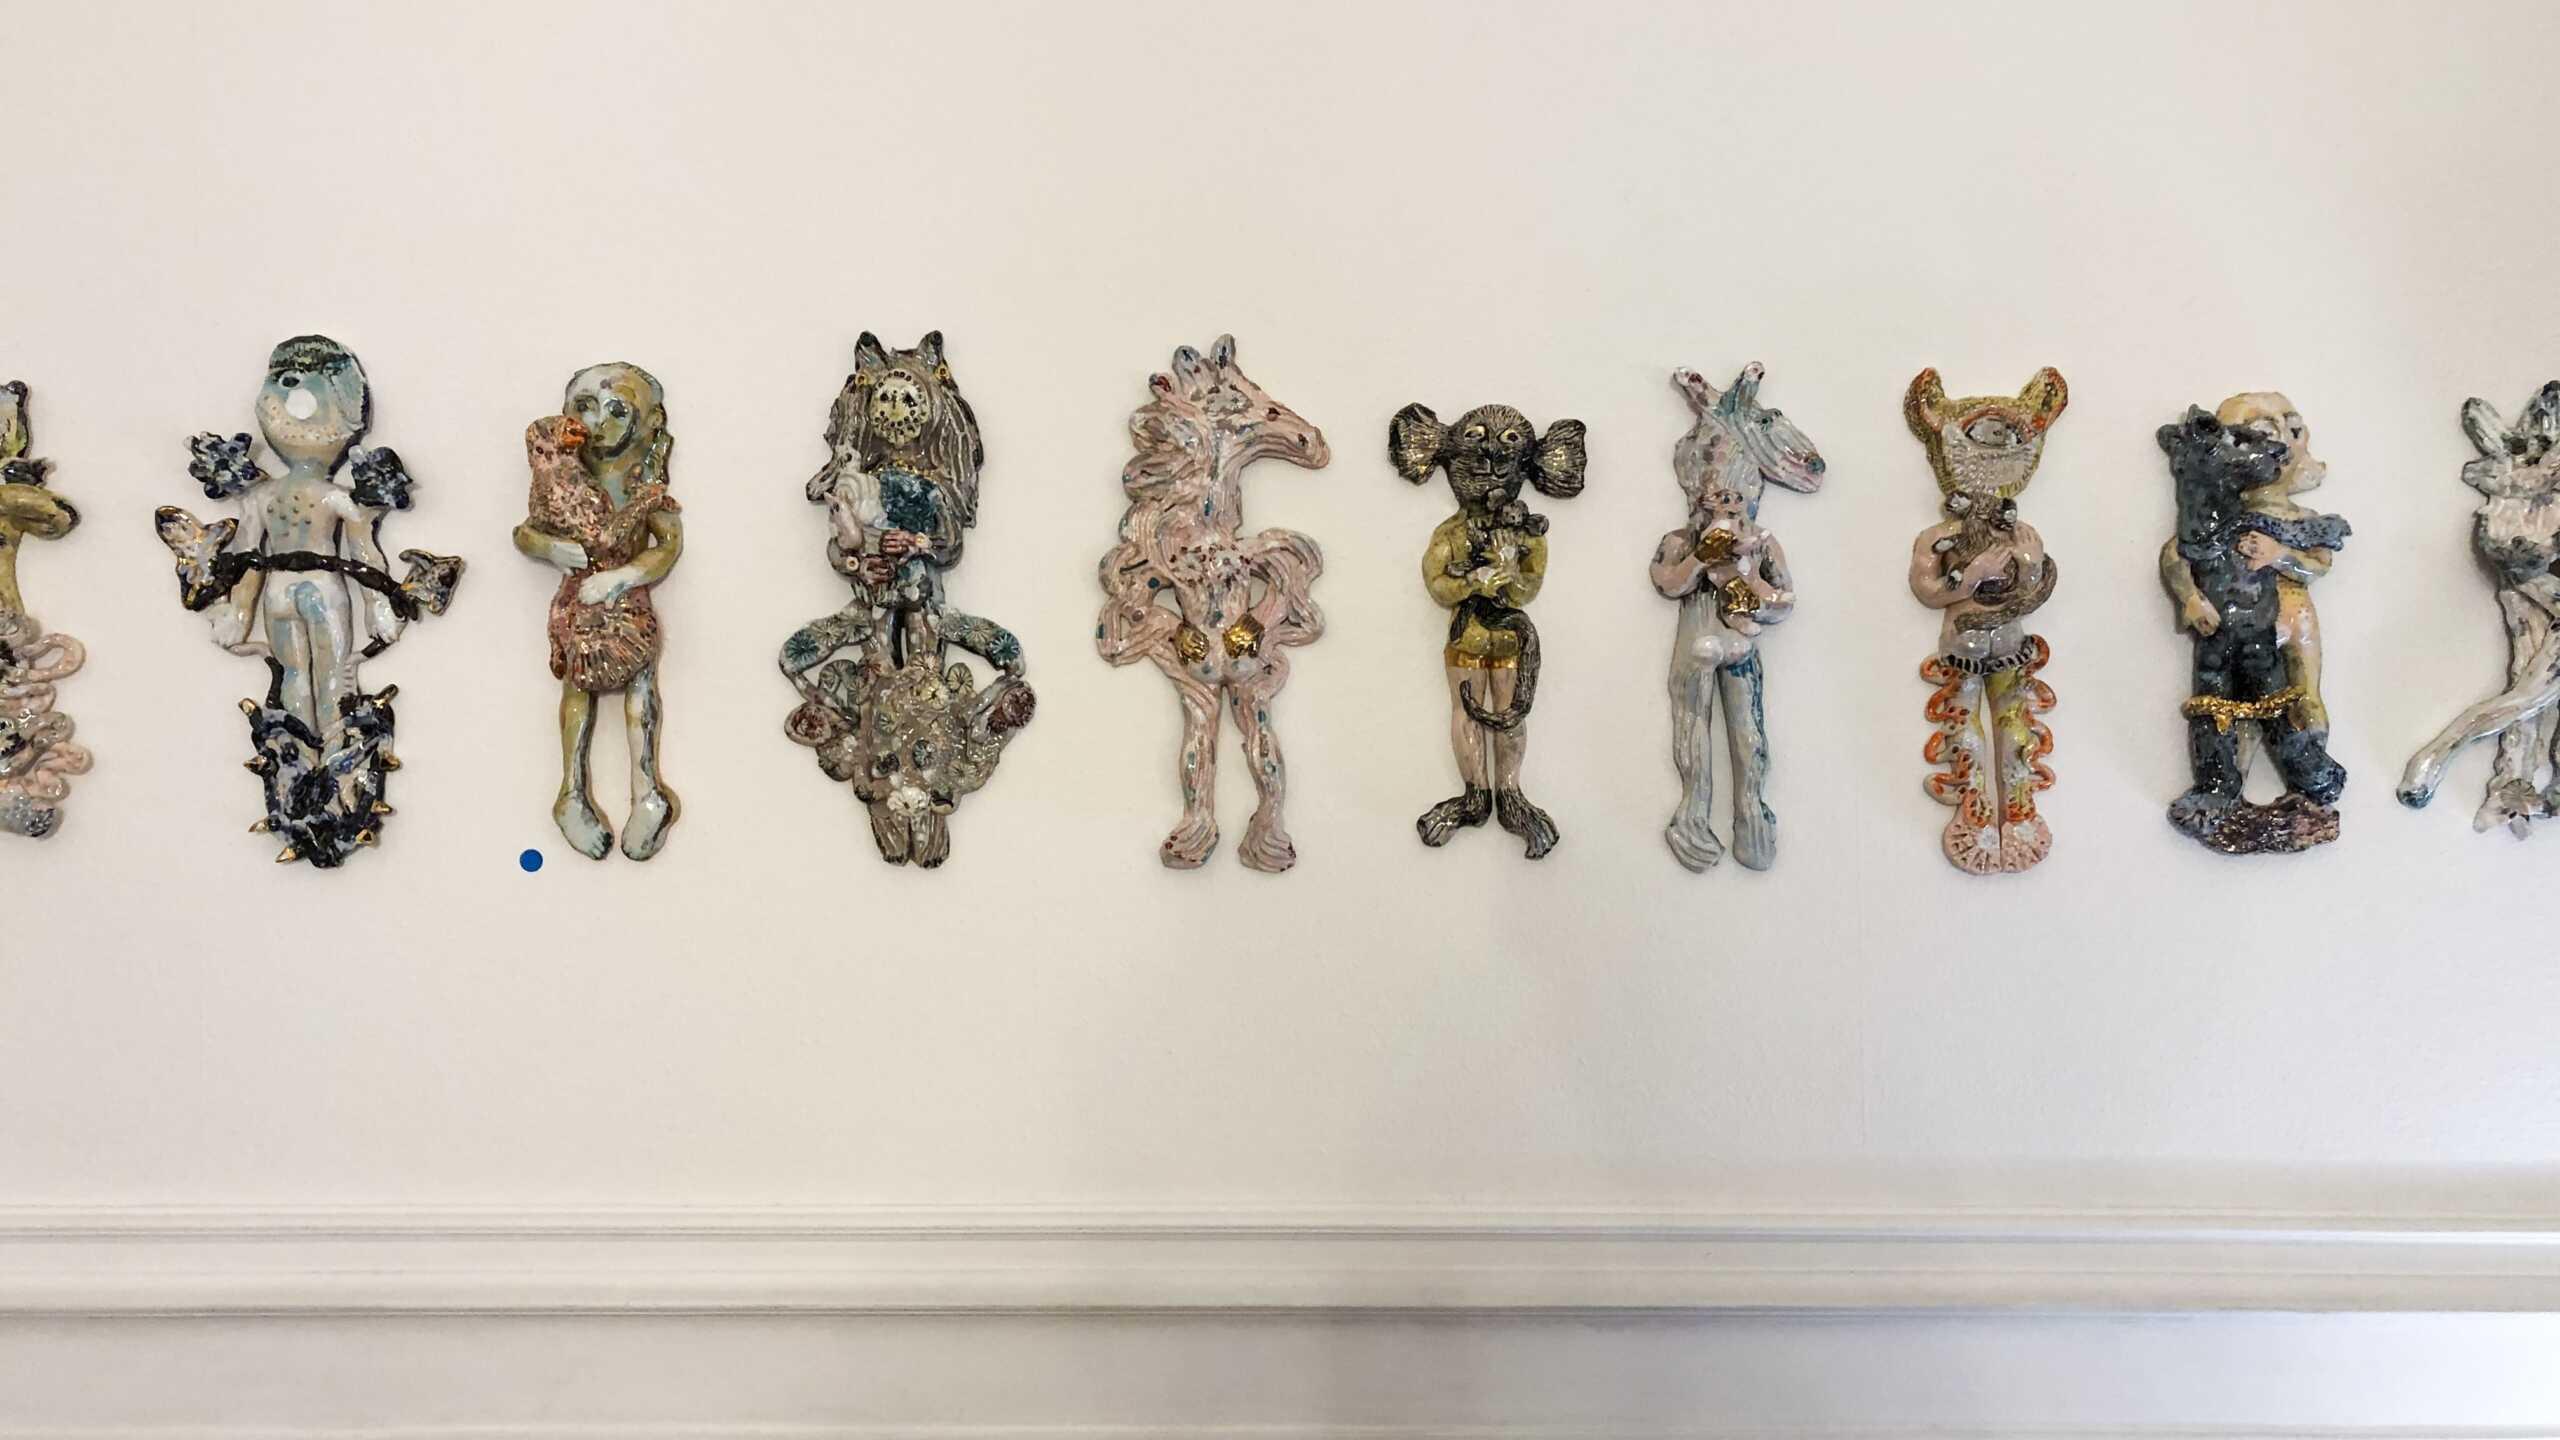 Saraï Delfendahl's amusing ceramic figures dancing on the wall